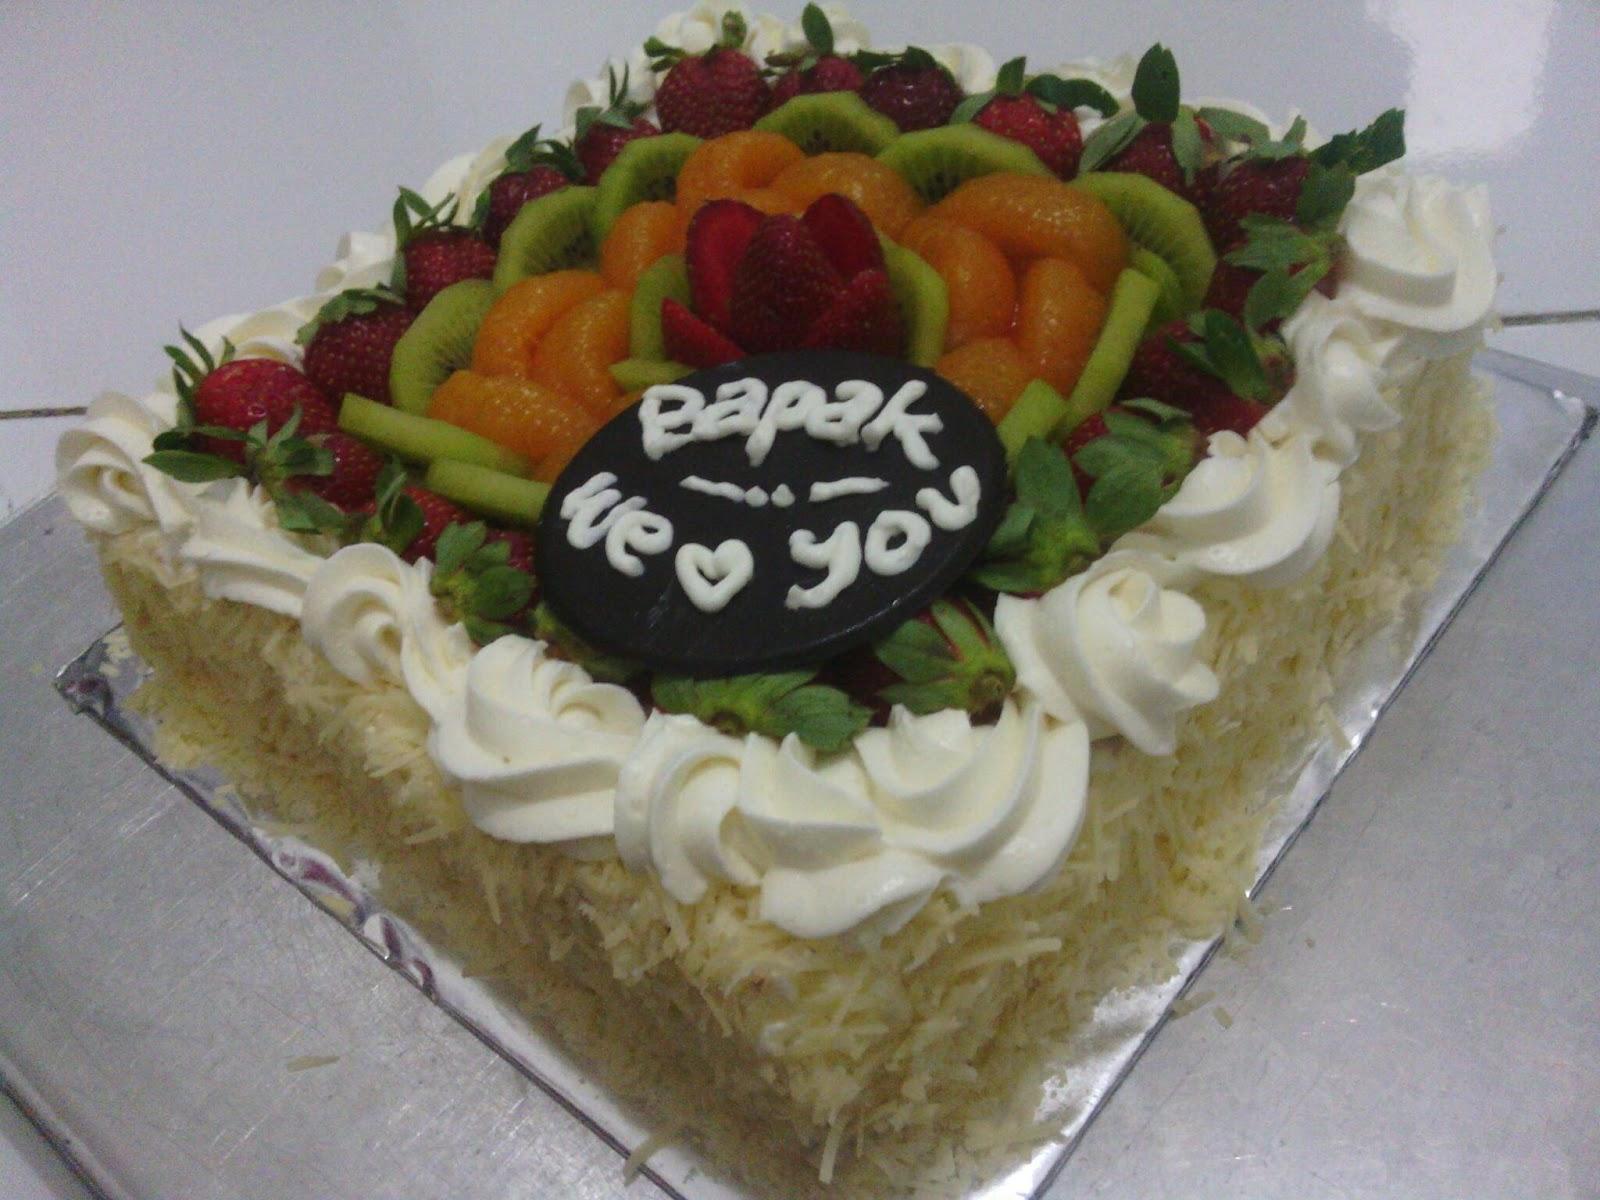 kue ulang tahun madiun: Kue ulang tahun madiun